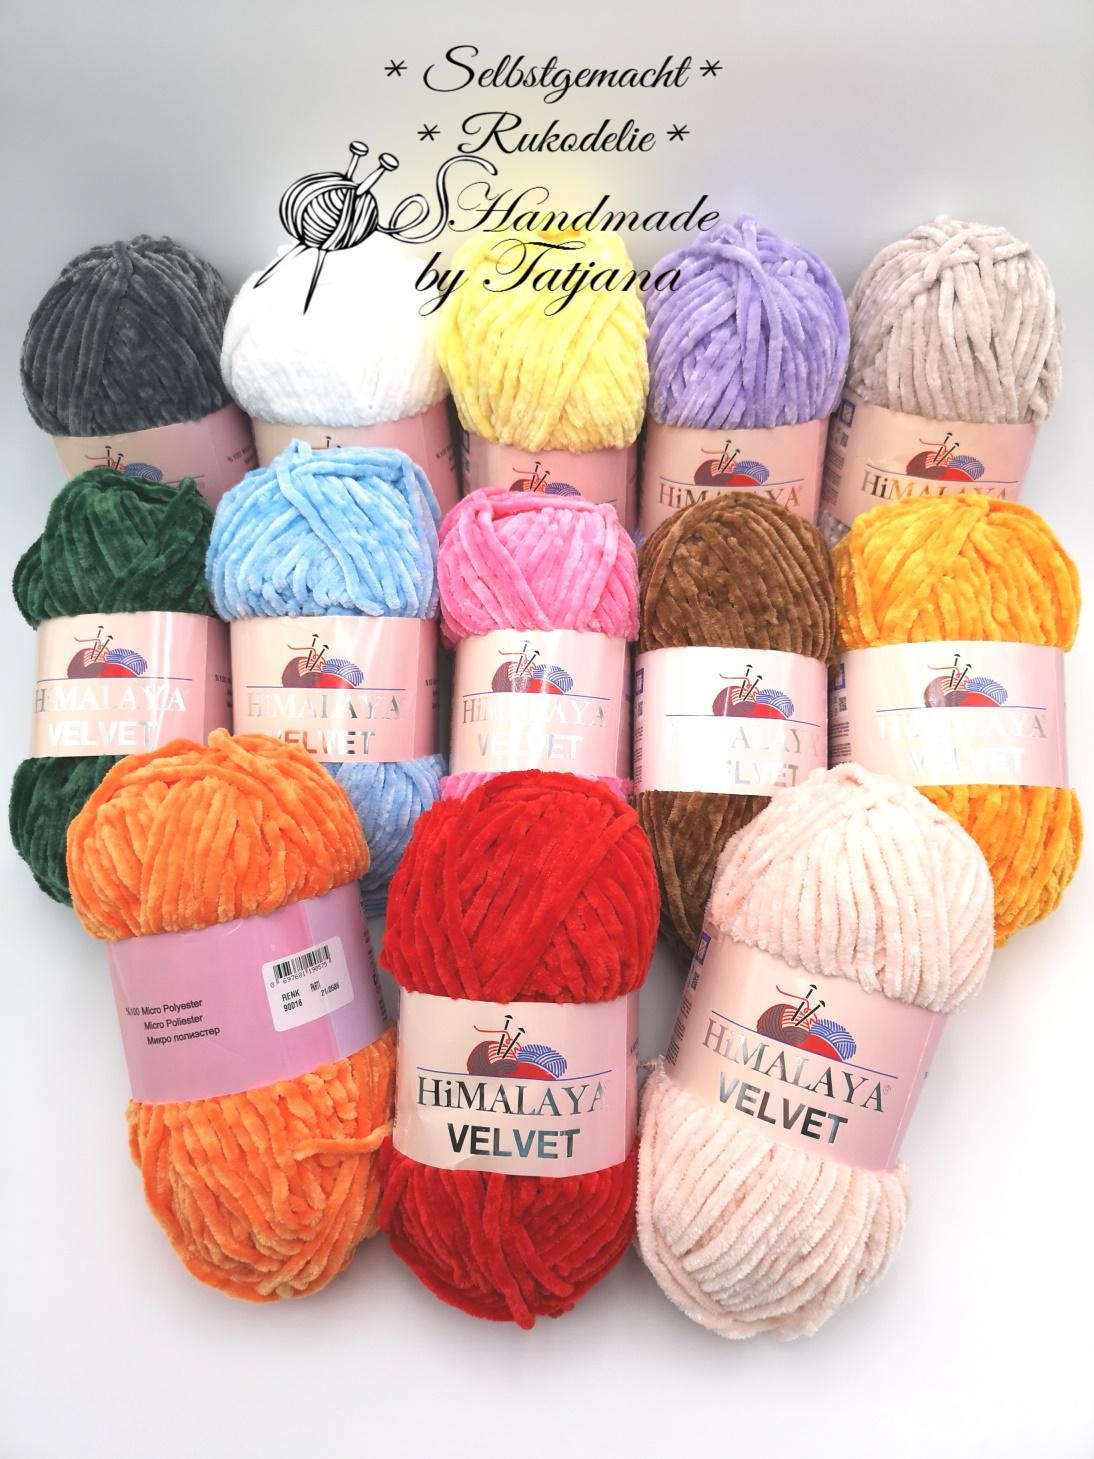 Himalaya Velvet - Chenille Wolle glänzend - neu im Shop